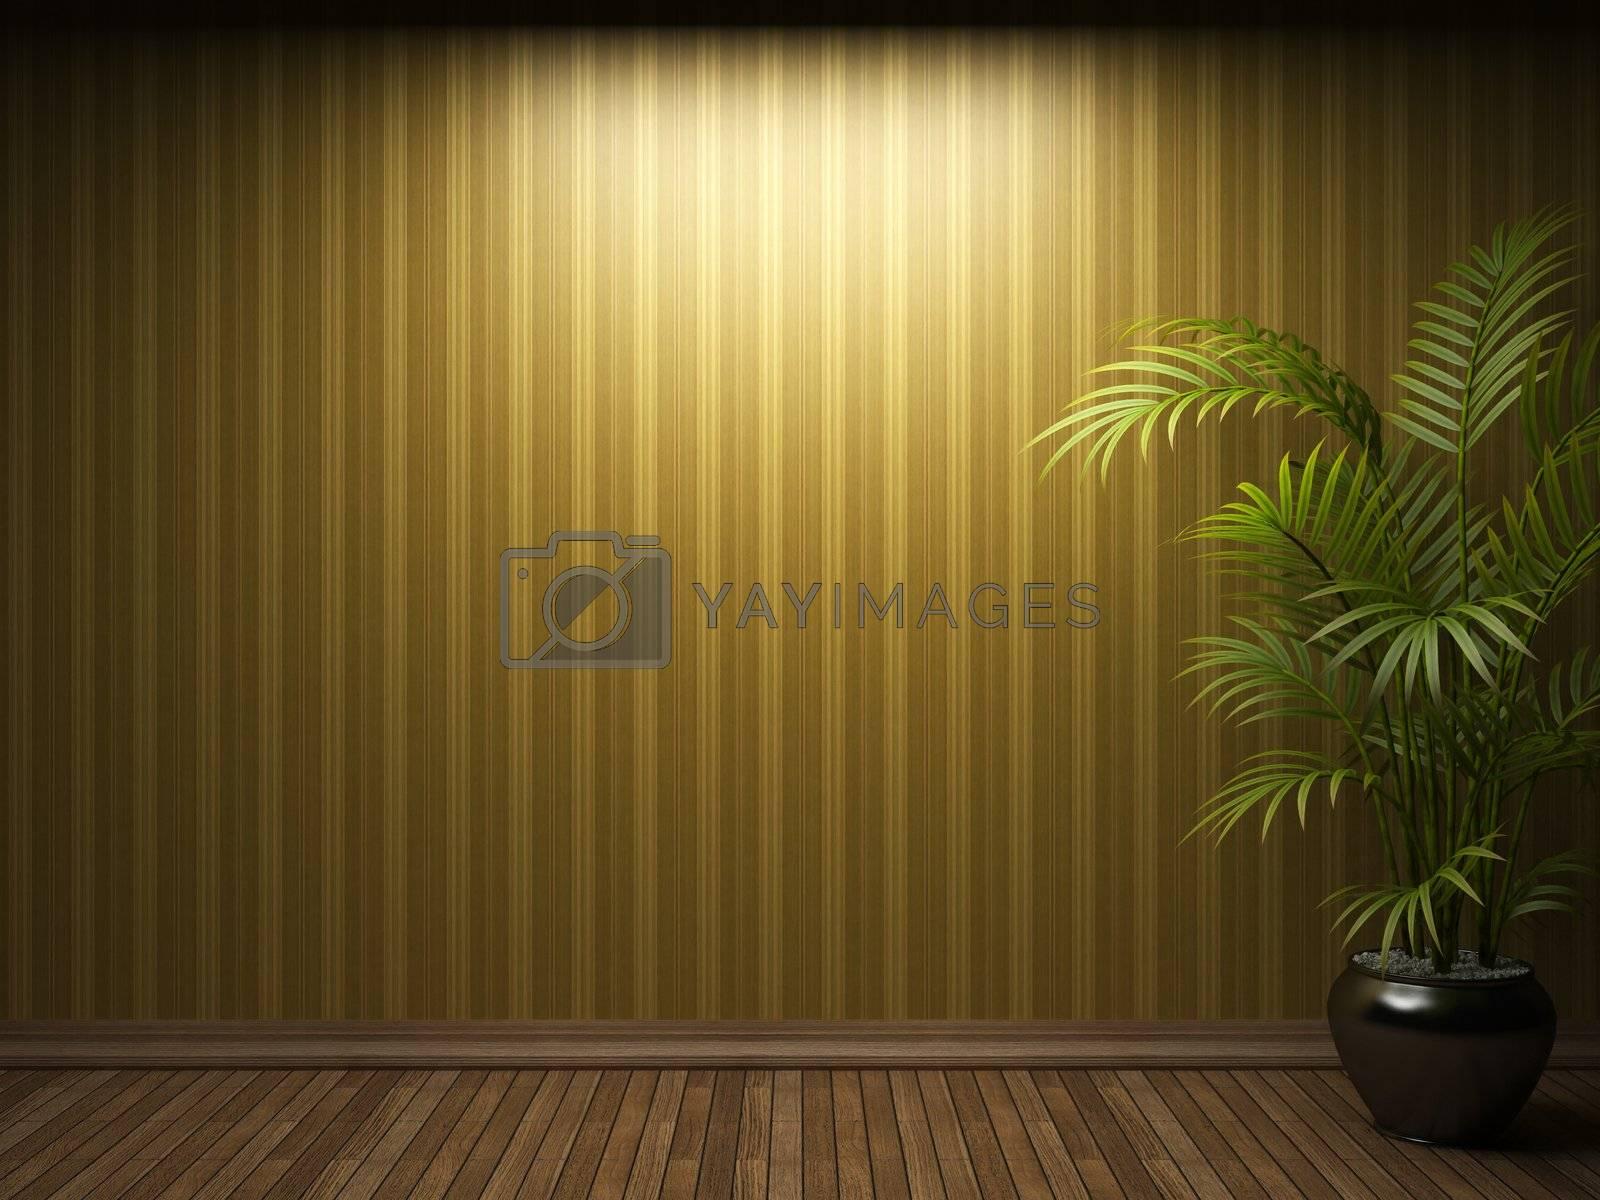 illuminated fabric wallpaper made in 3D